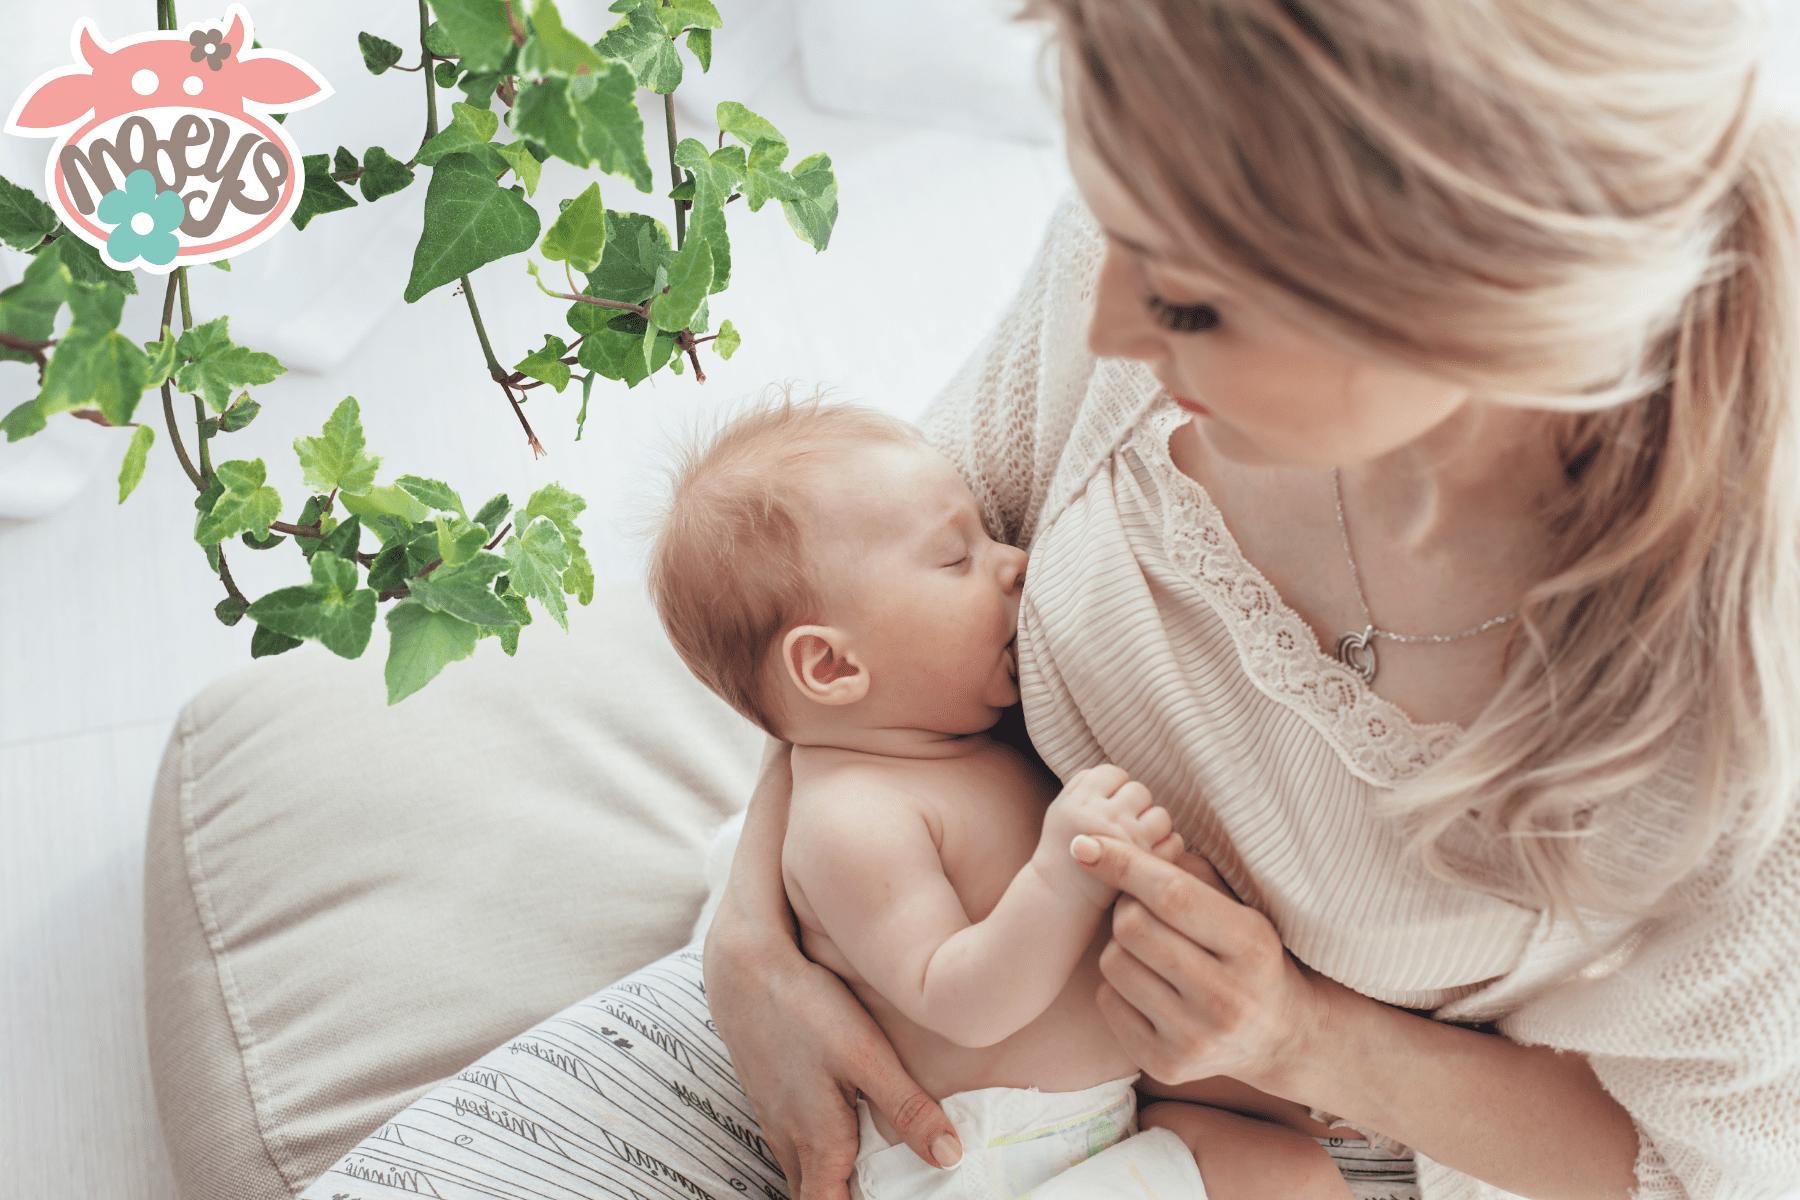 Breastfeeding in Mooeys Salons